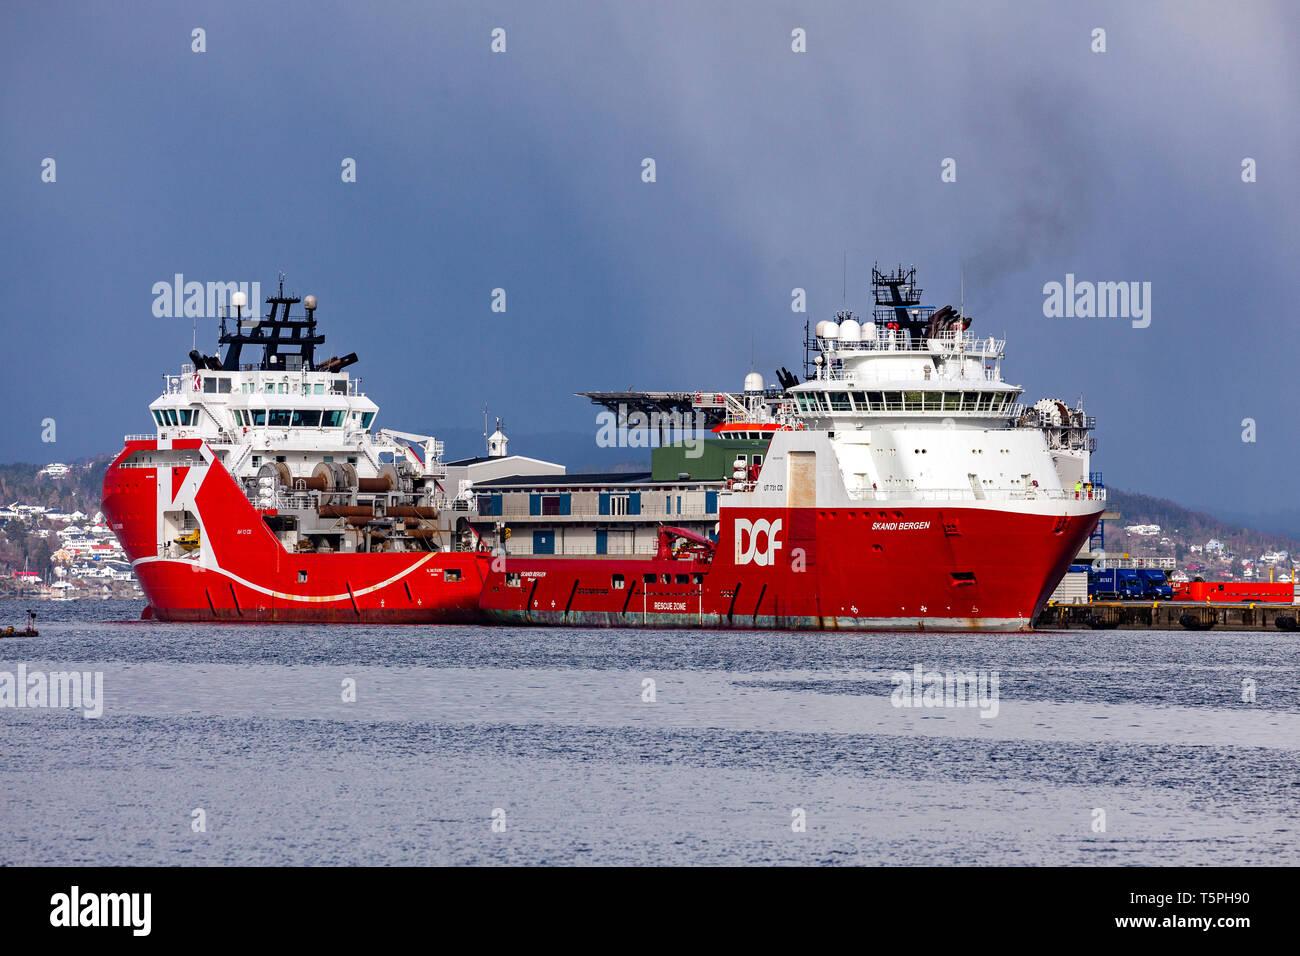 Offshore supply vessels KL Saltfjord and Skandi Bergen, in the port of Bergen, Norway. Skandi Bergen in the process of berthing at Skoltegrunnskaien t - Stock Image